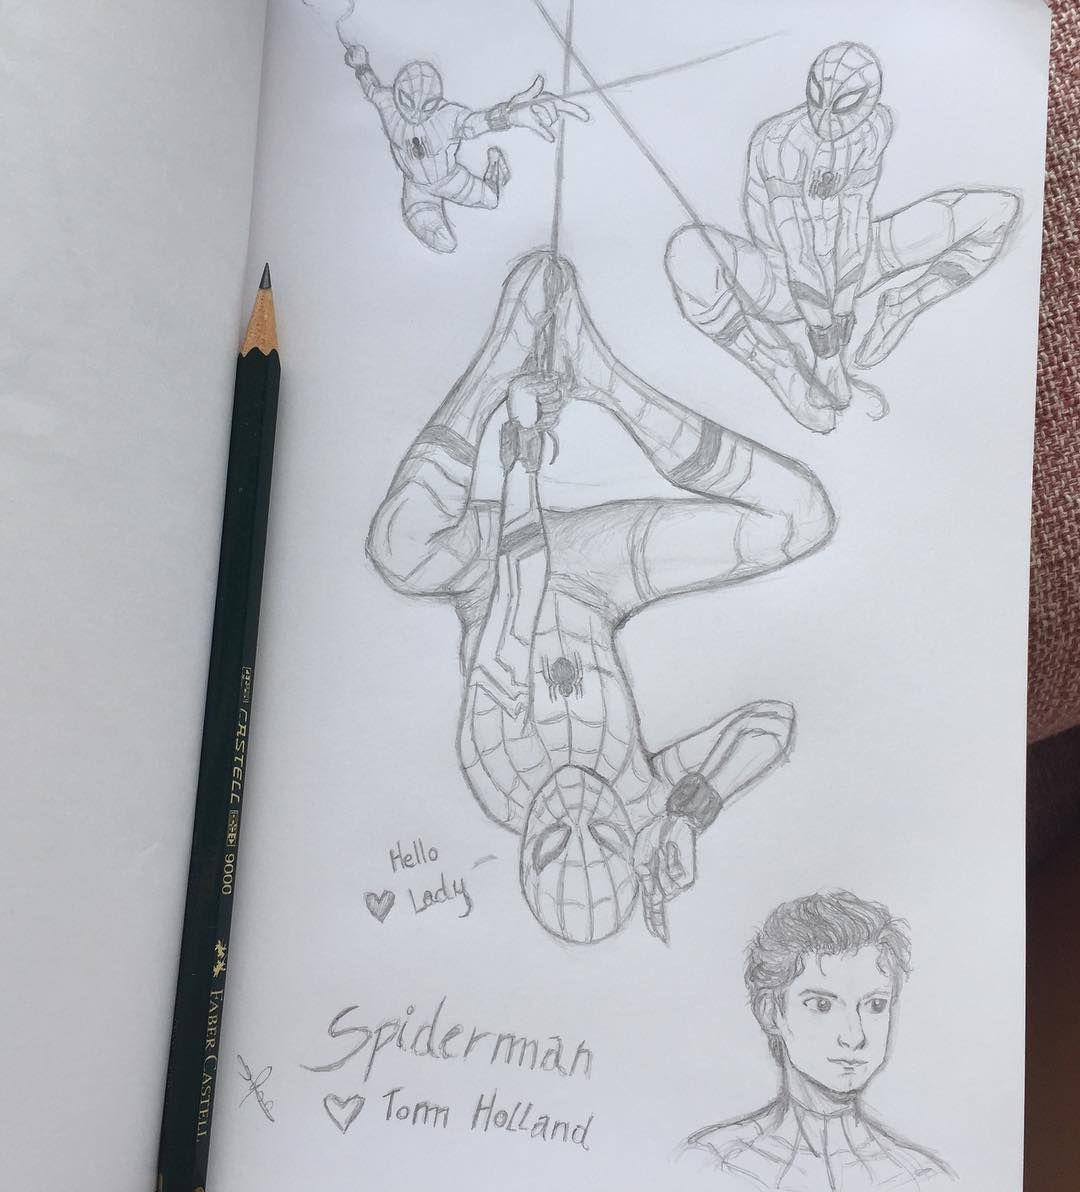 "Ika on Instagram: ""Spiderman 🕷 I Love Tom Holland like Spiderman! ❤️ #spiderman #tomholland #drawing #spidermandrawing #drawing #art #pencil #sketch #boy…"""